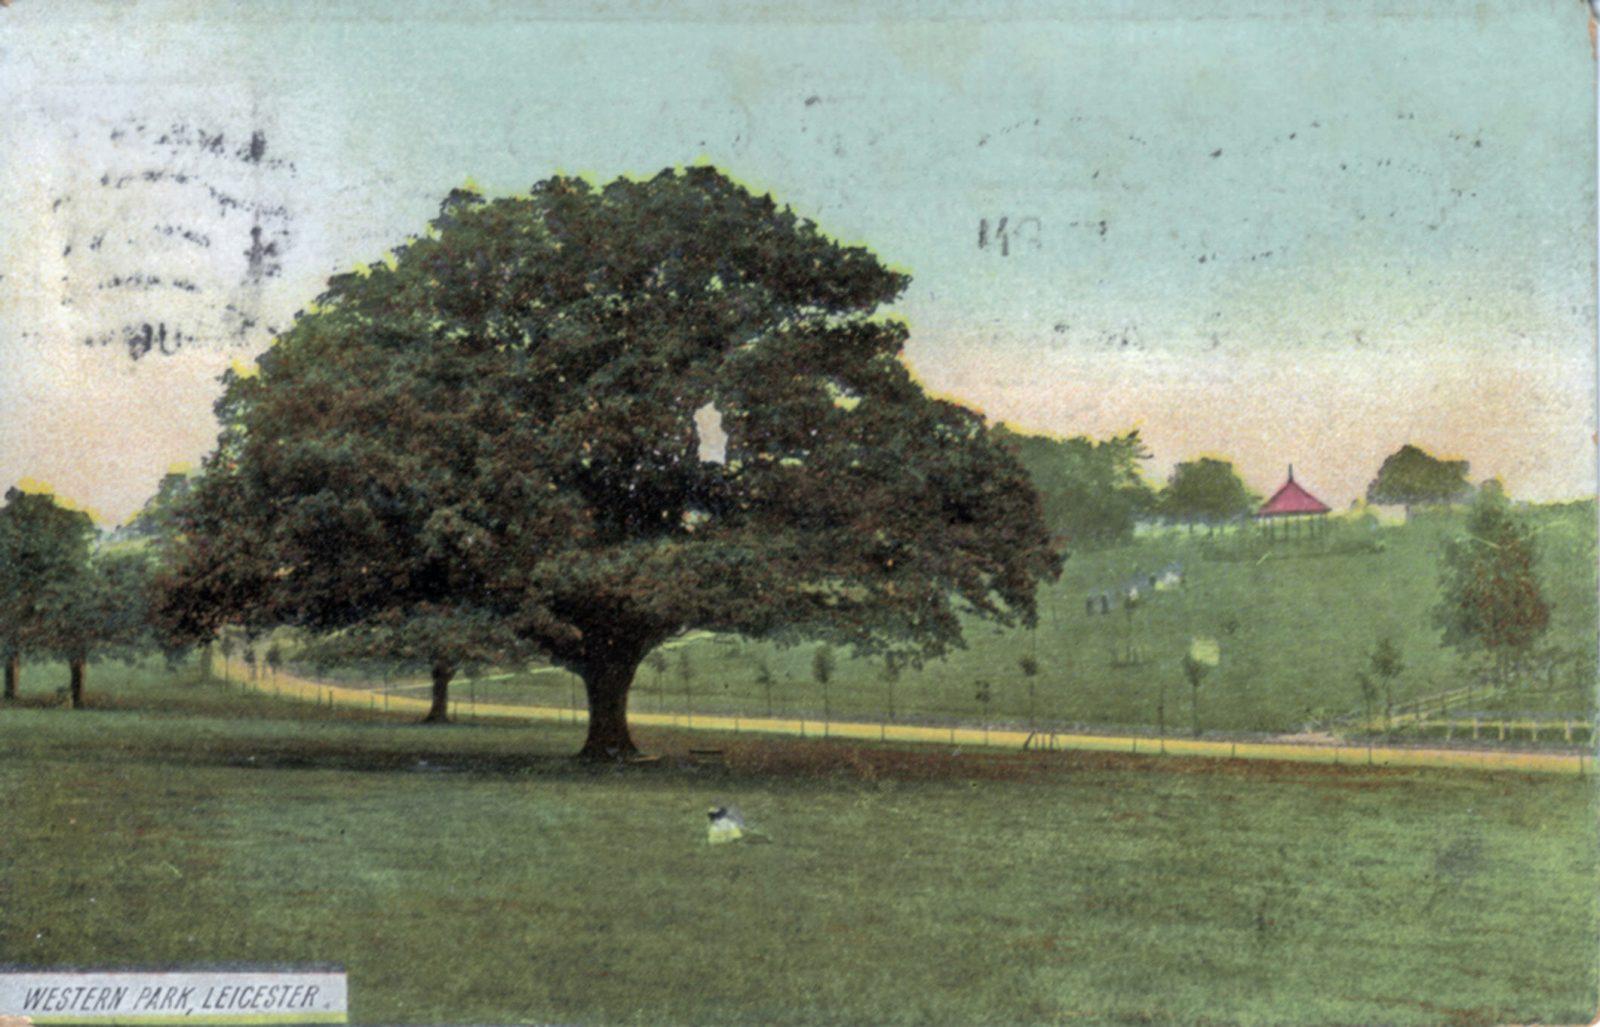 Western Park, Leicester. 1901-1920: Major Oak - an ancient oak tree. Bandstand in background. Franked 1913 (File:1086)